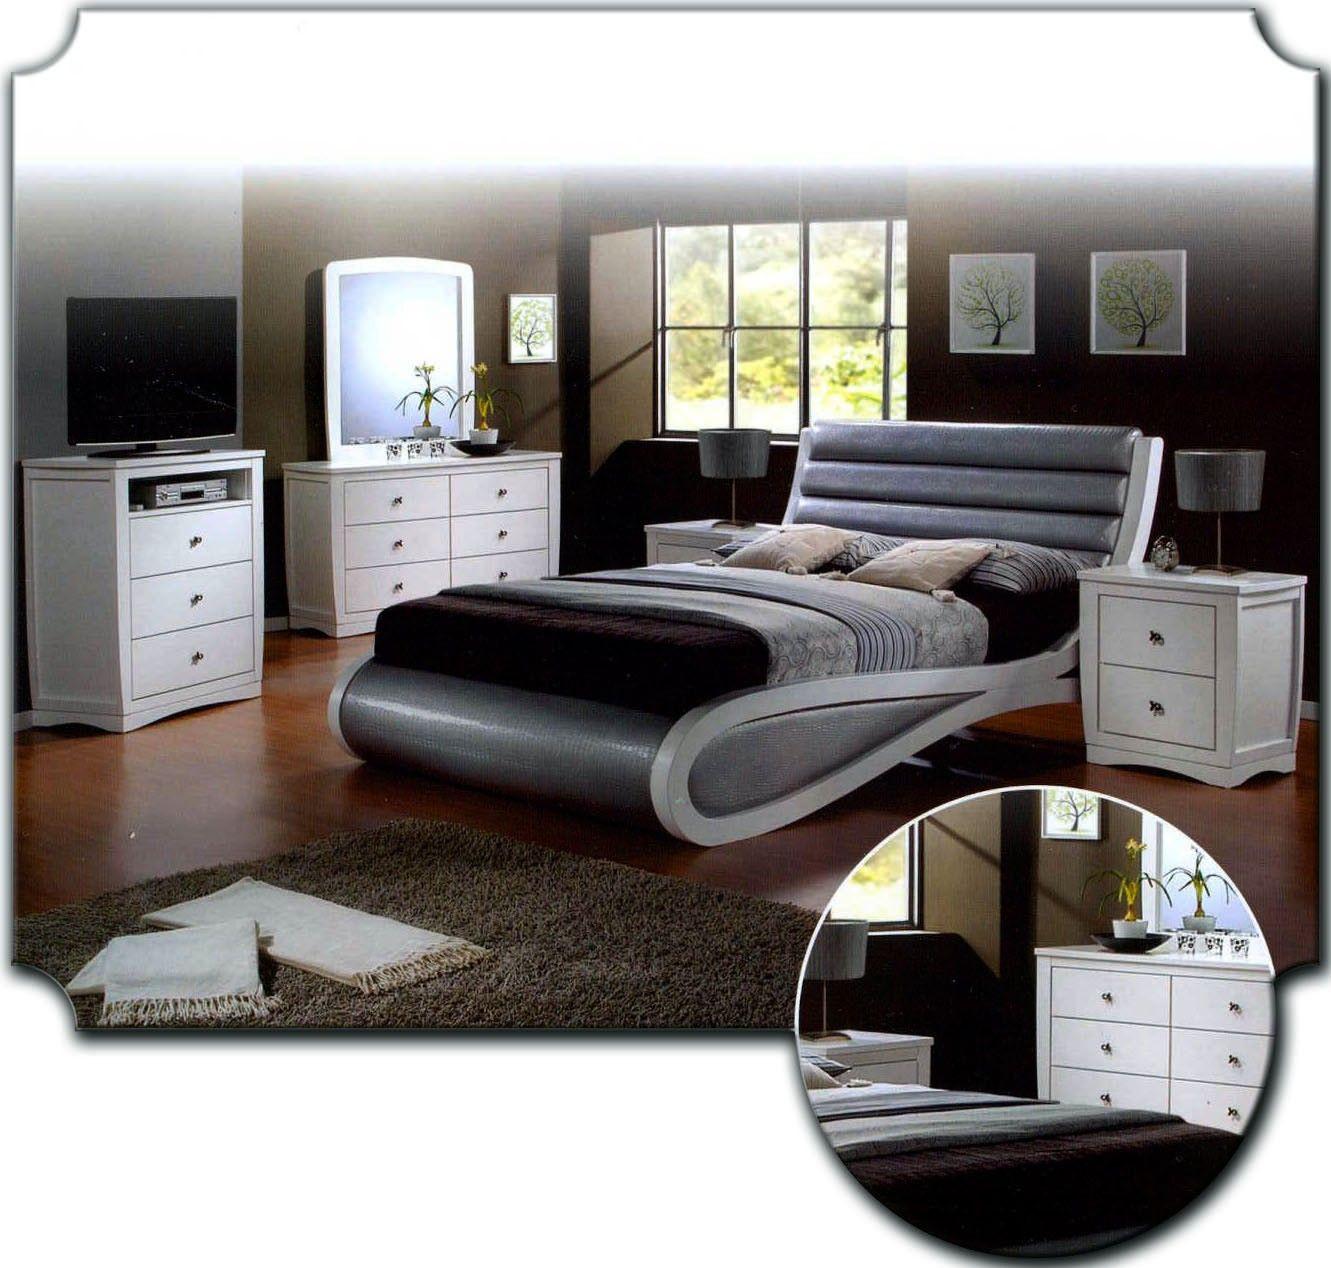 Teen Boy Bedroom Furniture Awesome Bedroom Ideas for Teenage Guys Teen Platform Bedroom Sets